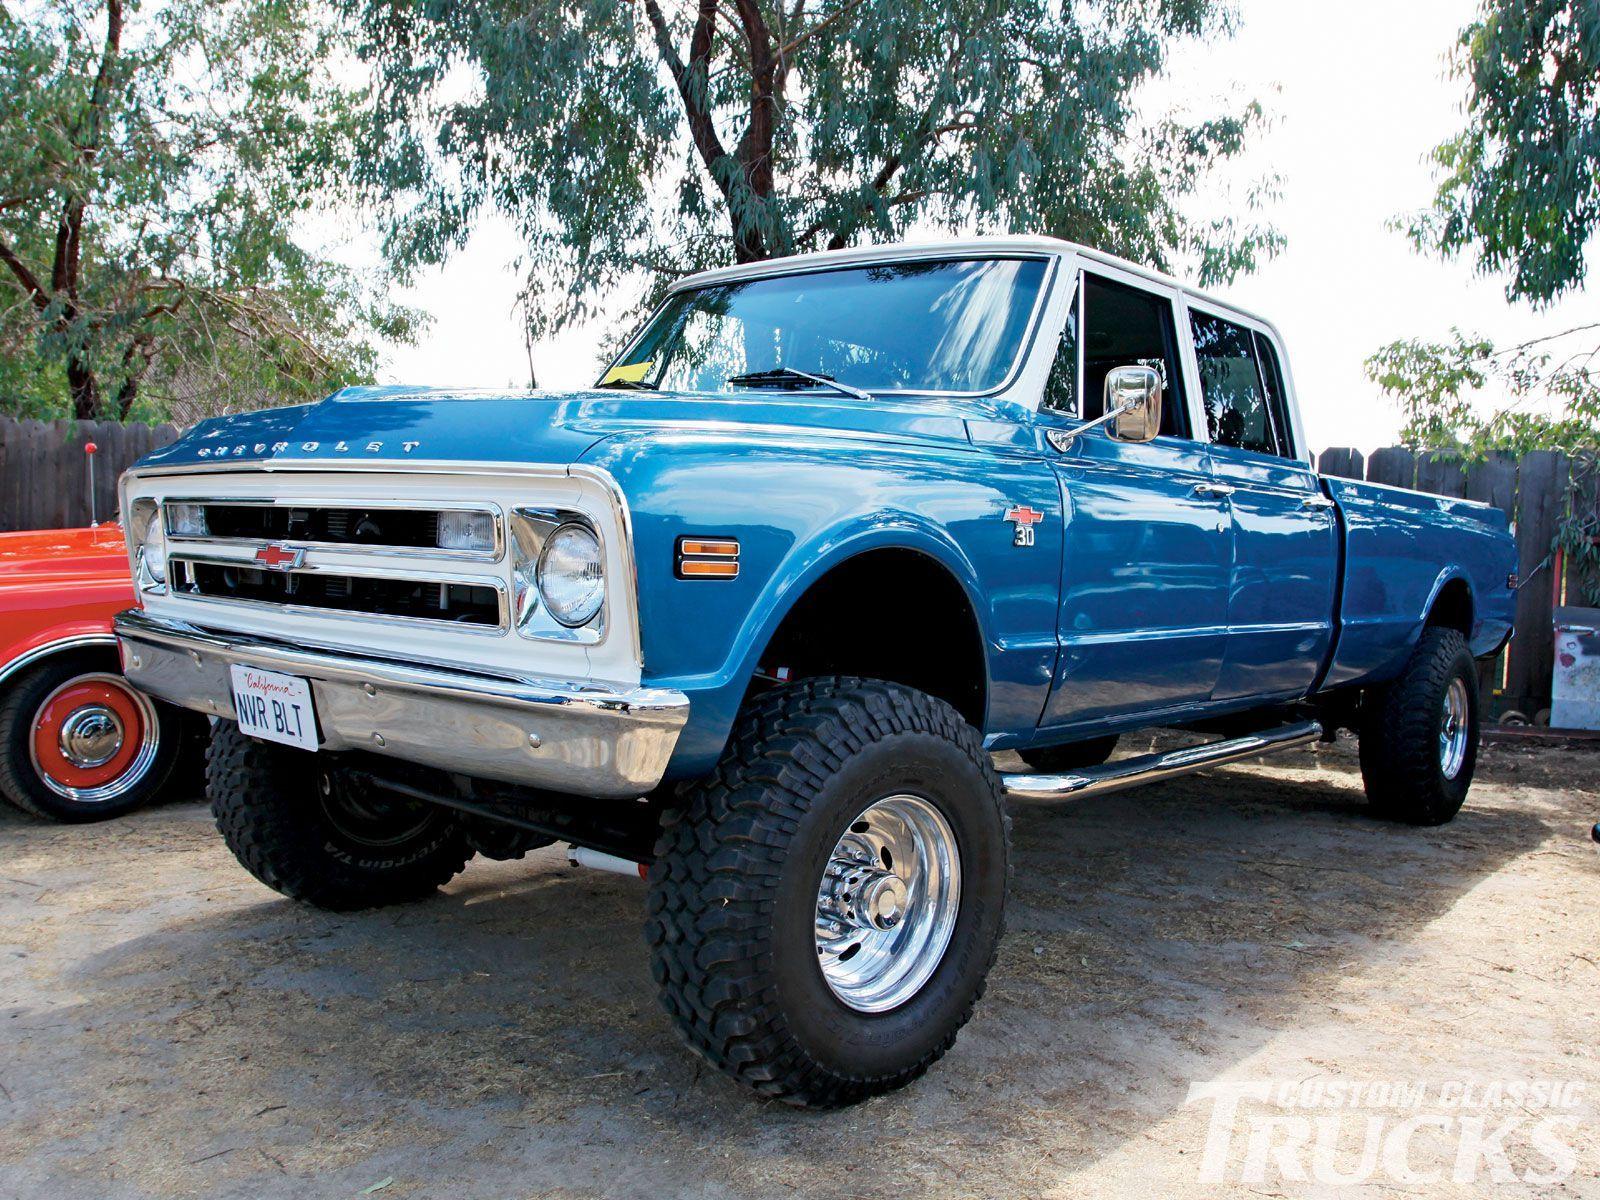 1972 Chevy Trucks For Sale Craigslist Trucks Chevy Trucks 72 Chevy Truck